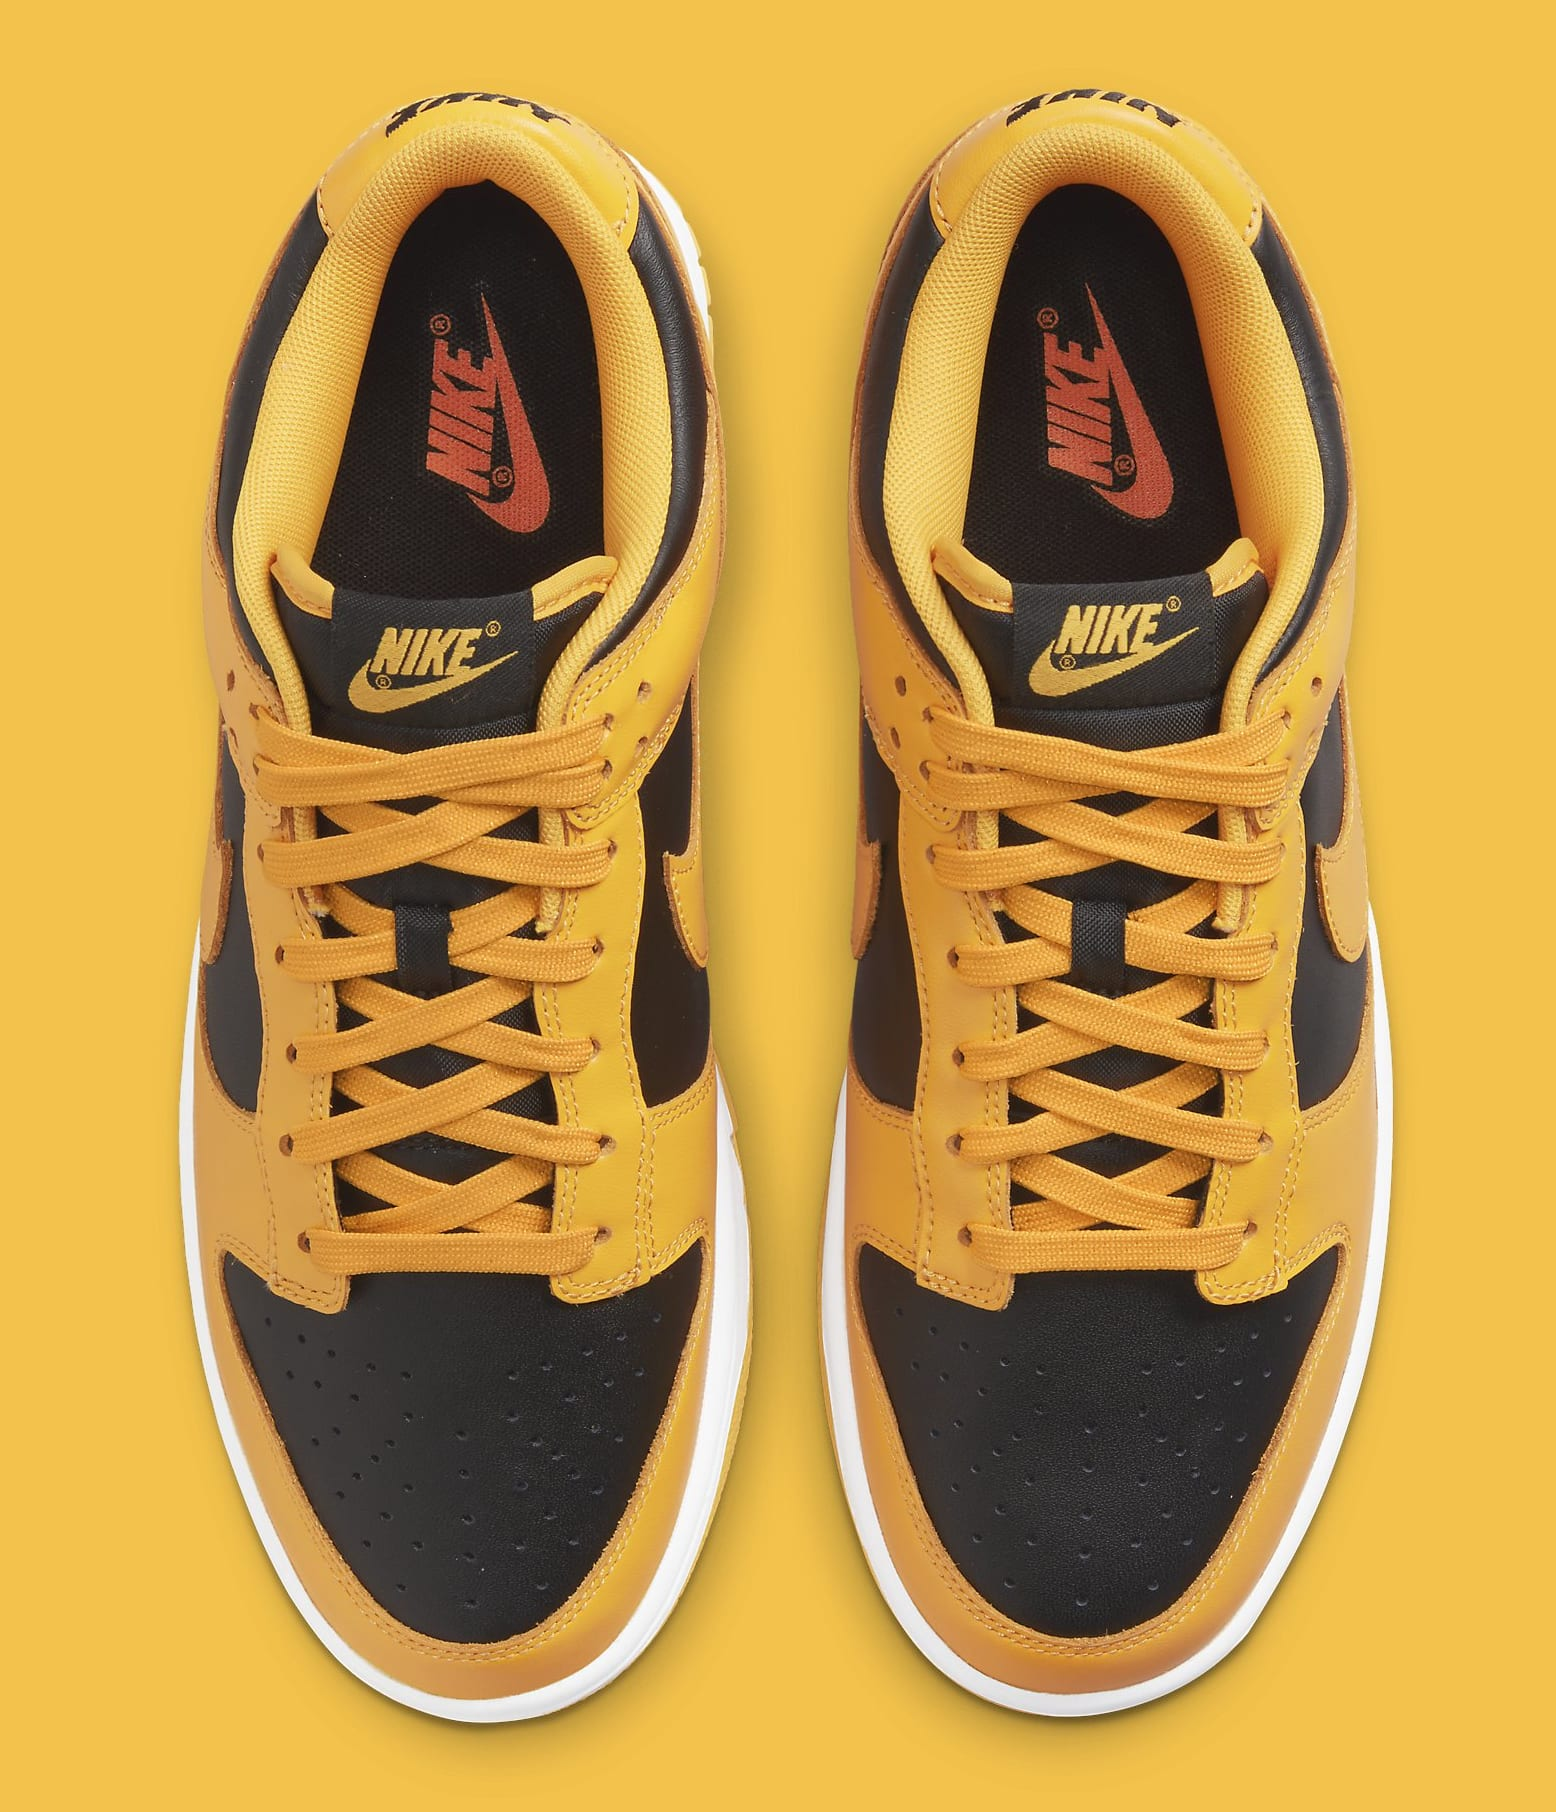 Nike Dunk Low 'Iowa' DD1391-004 (Top)